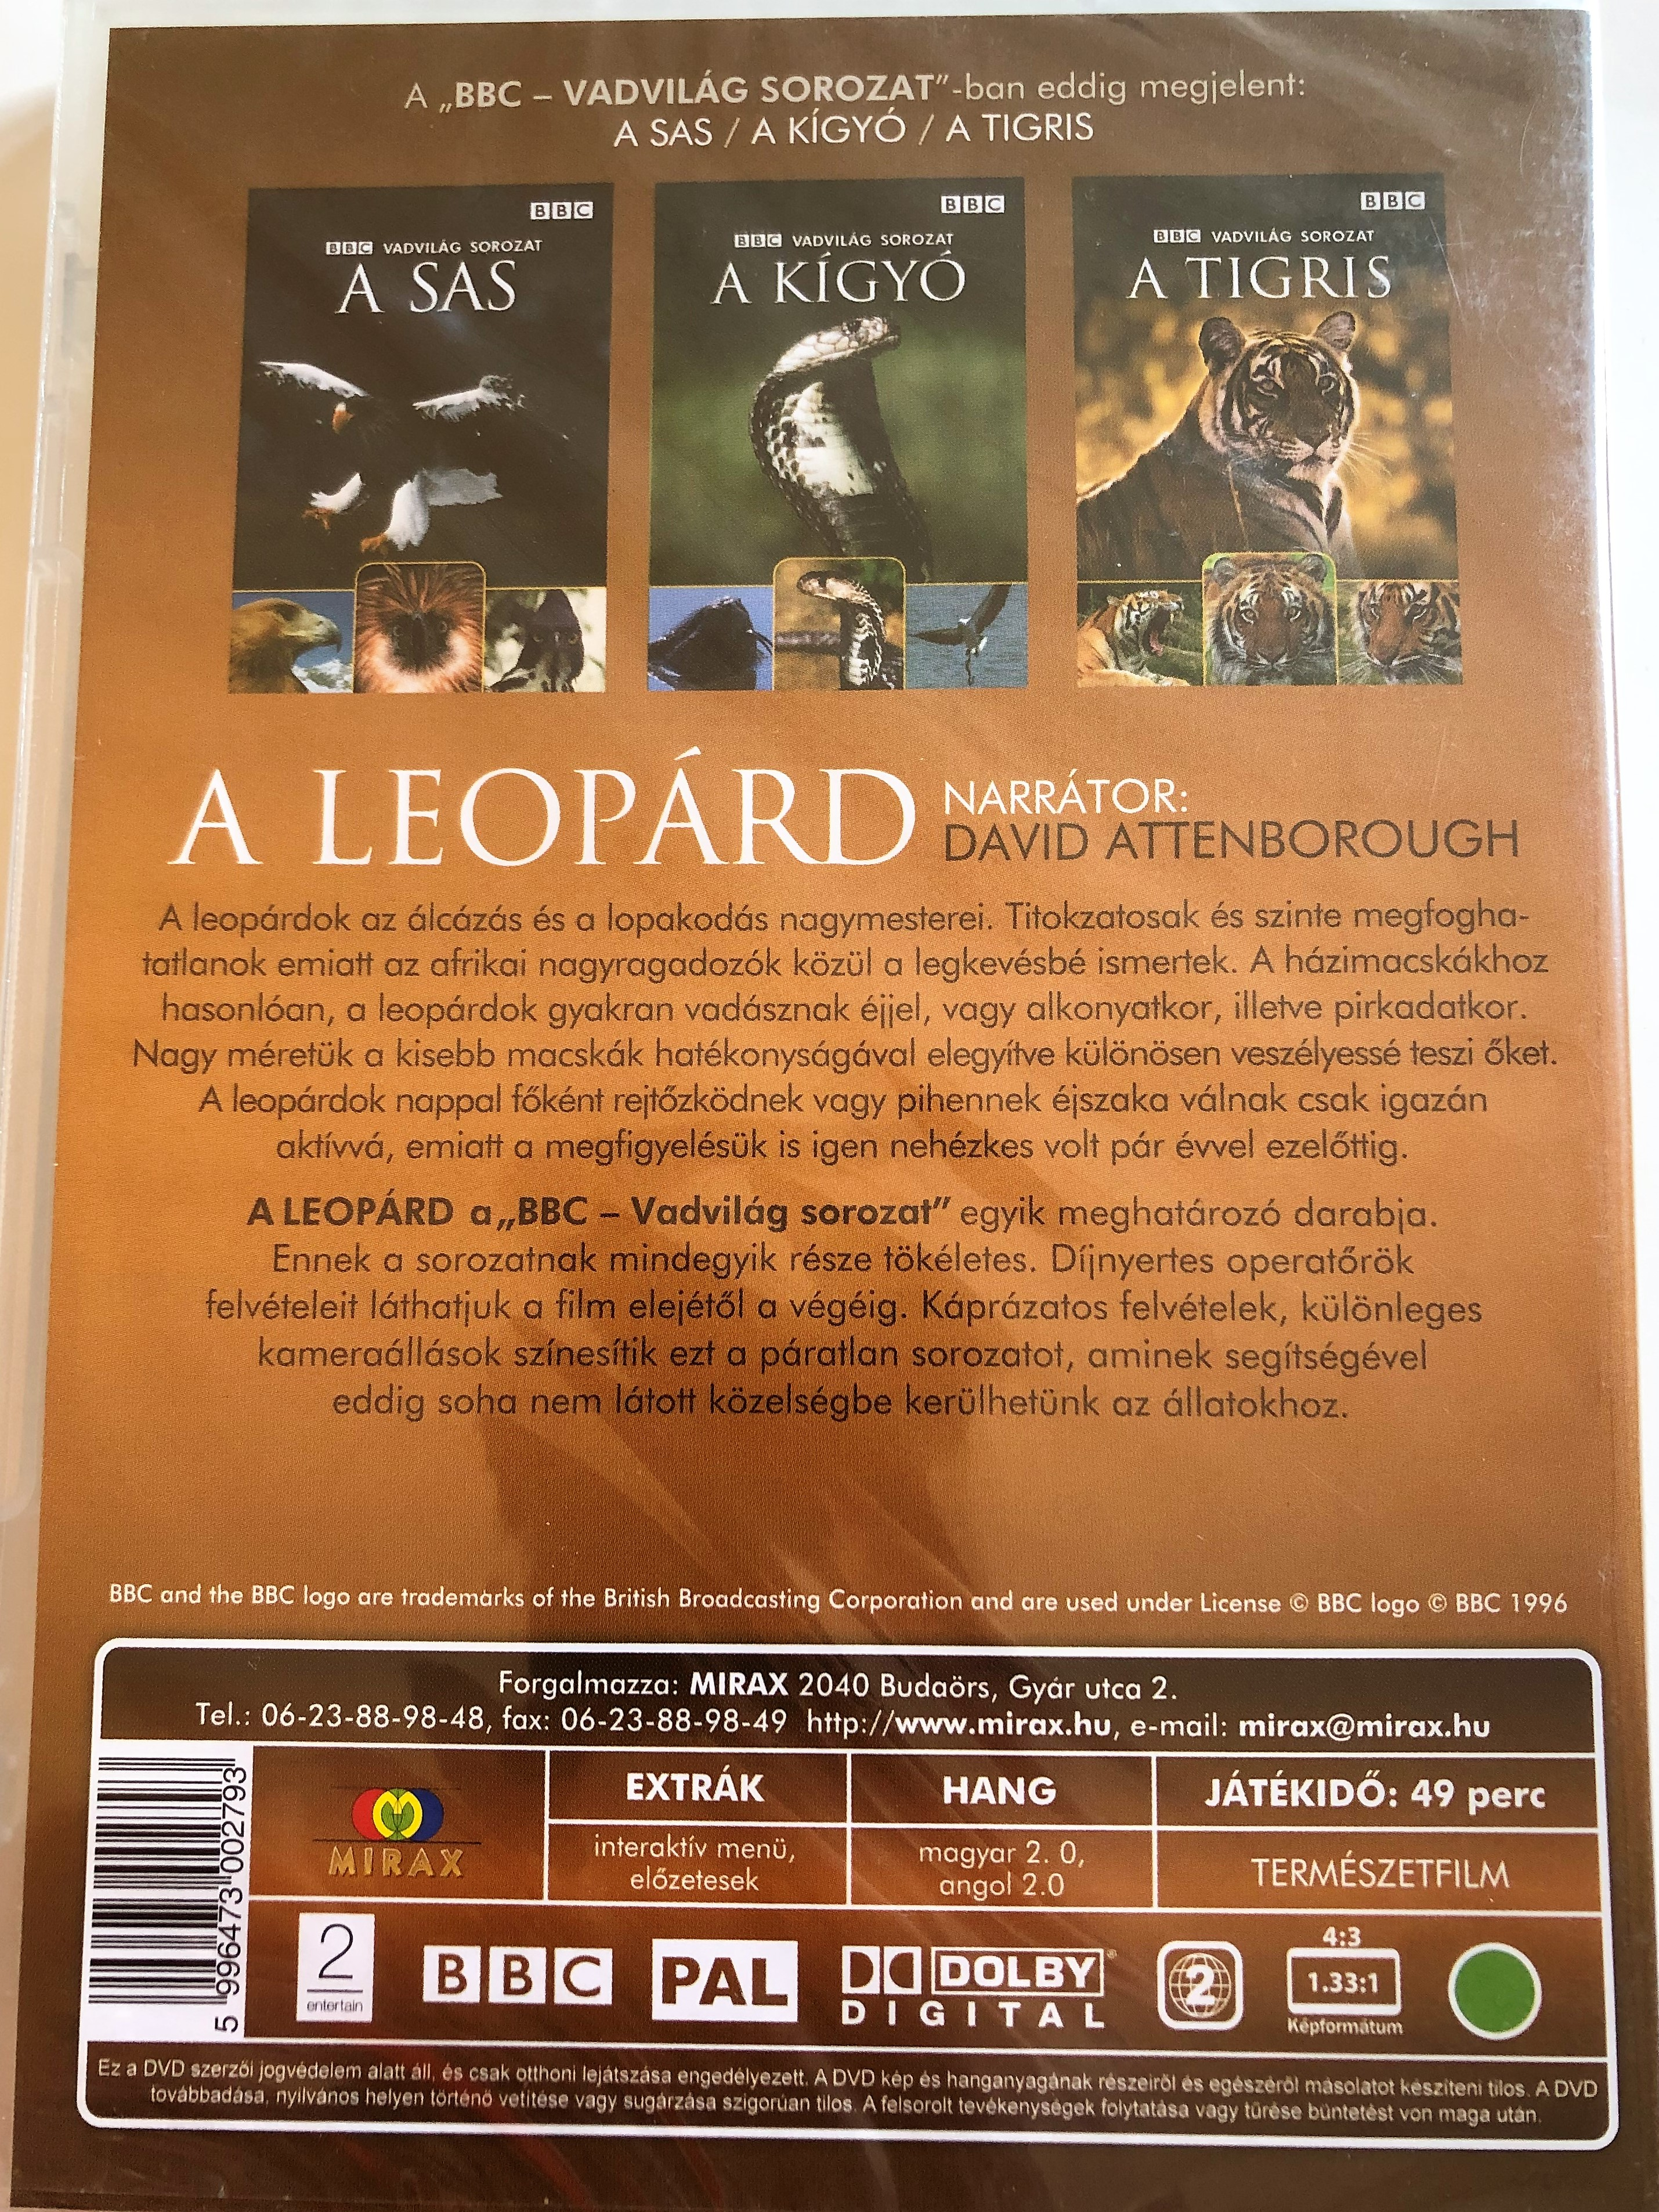 a-leop-rd-the-lepard-bbc-wildlife-series-narrated-by-sir-david-attenborough-dvd-2004-bbc-vadvil-g-sorozat-2-.jpg